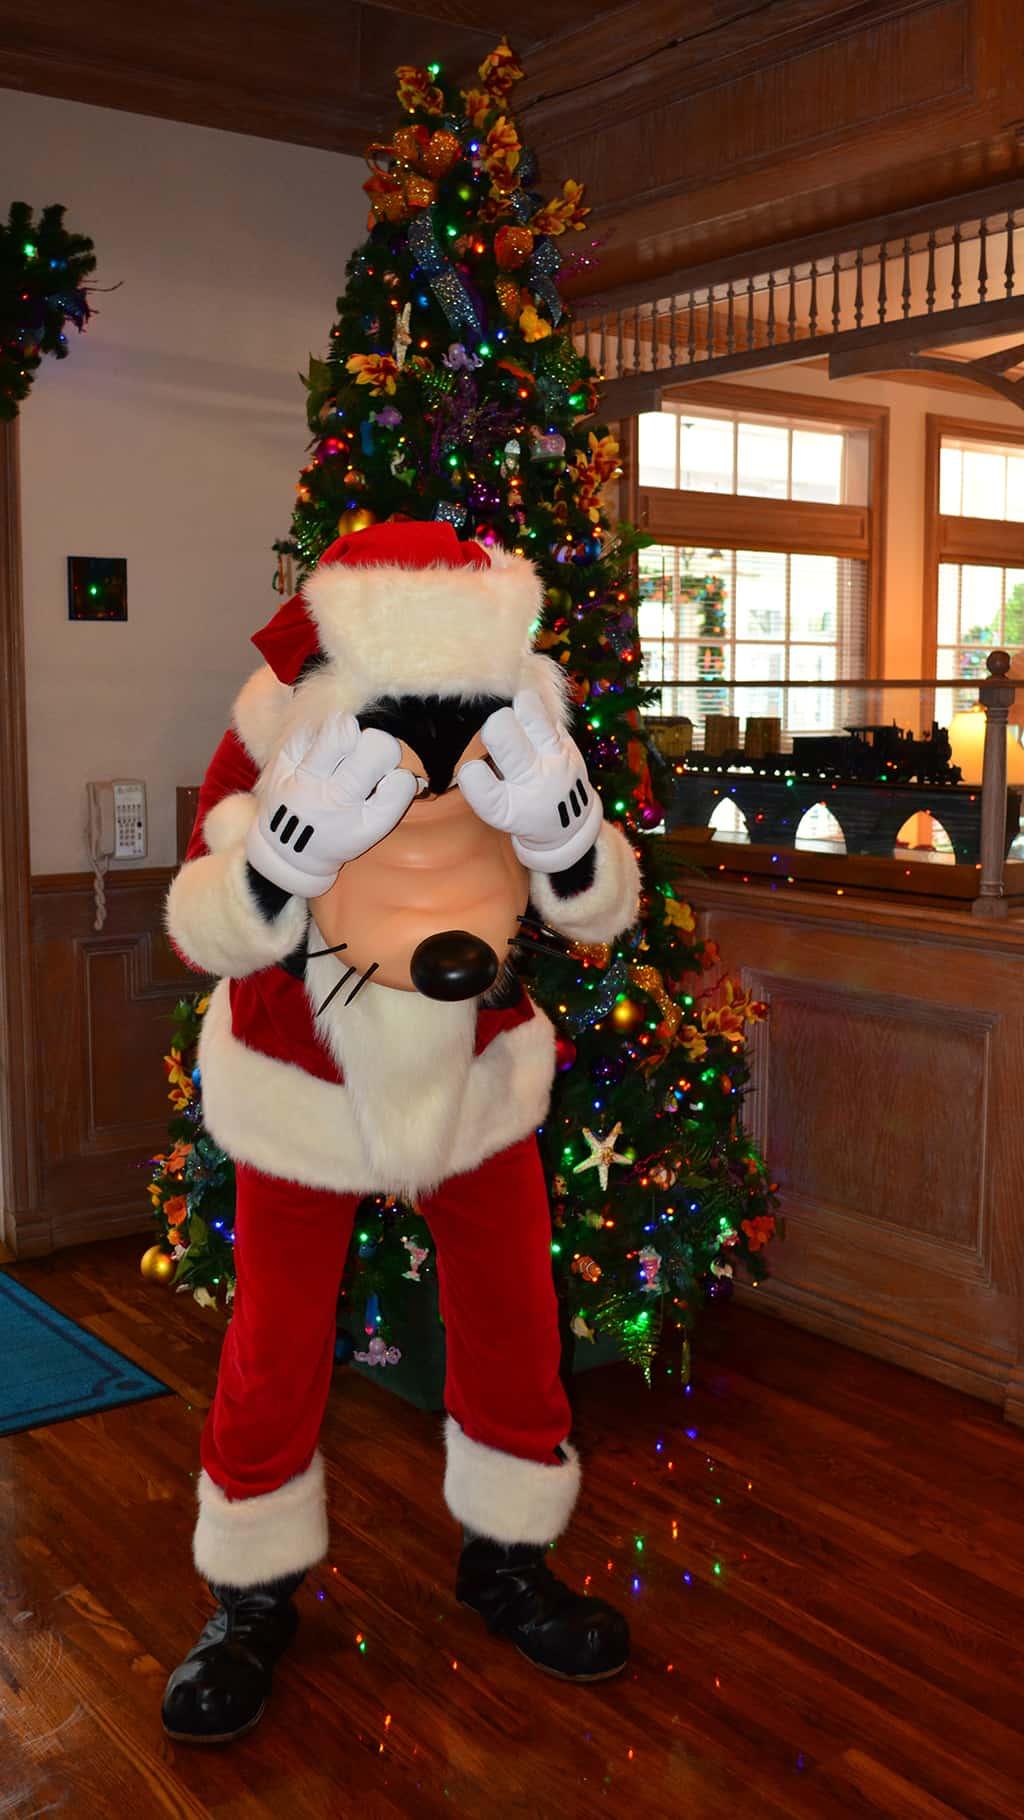 Walt Disney World Old Key West Resort Christmas Characters Santa Goofy Christmas Decor (5)